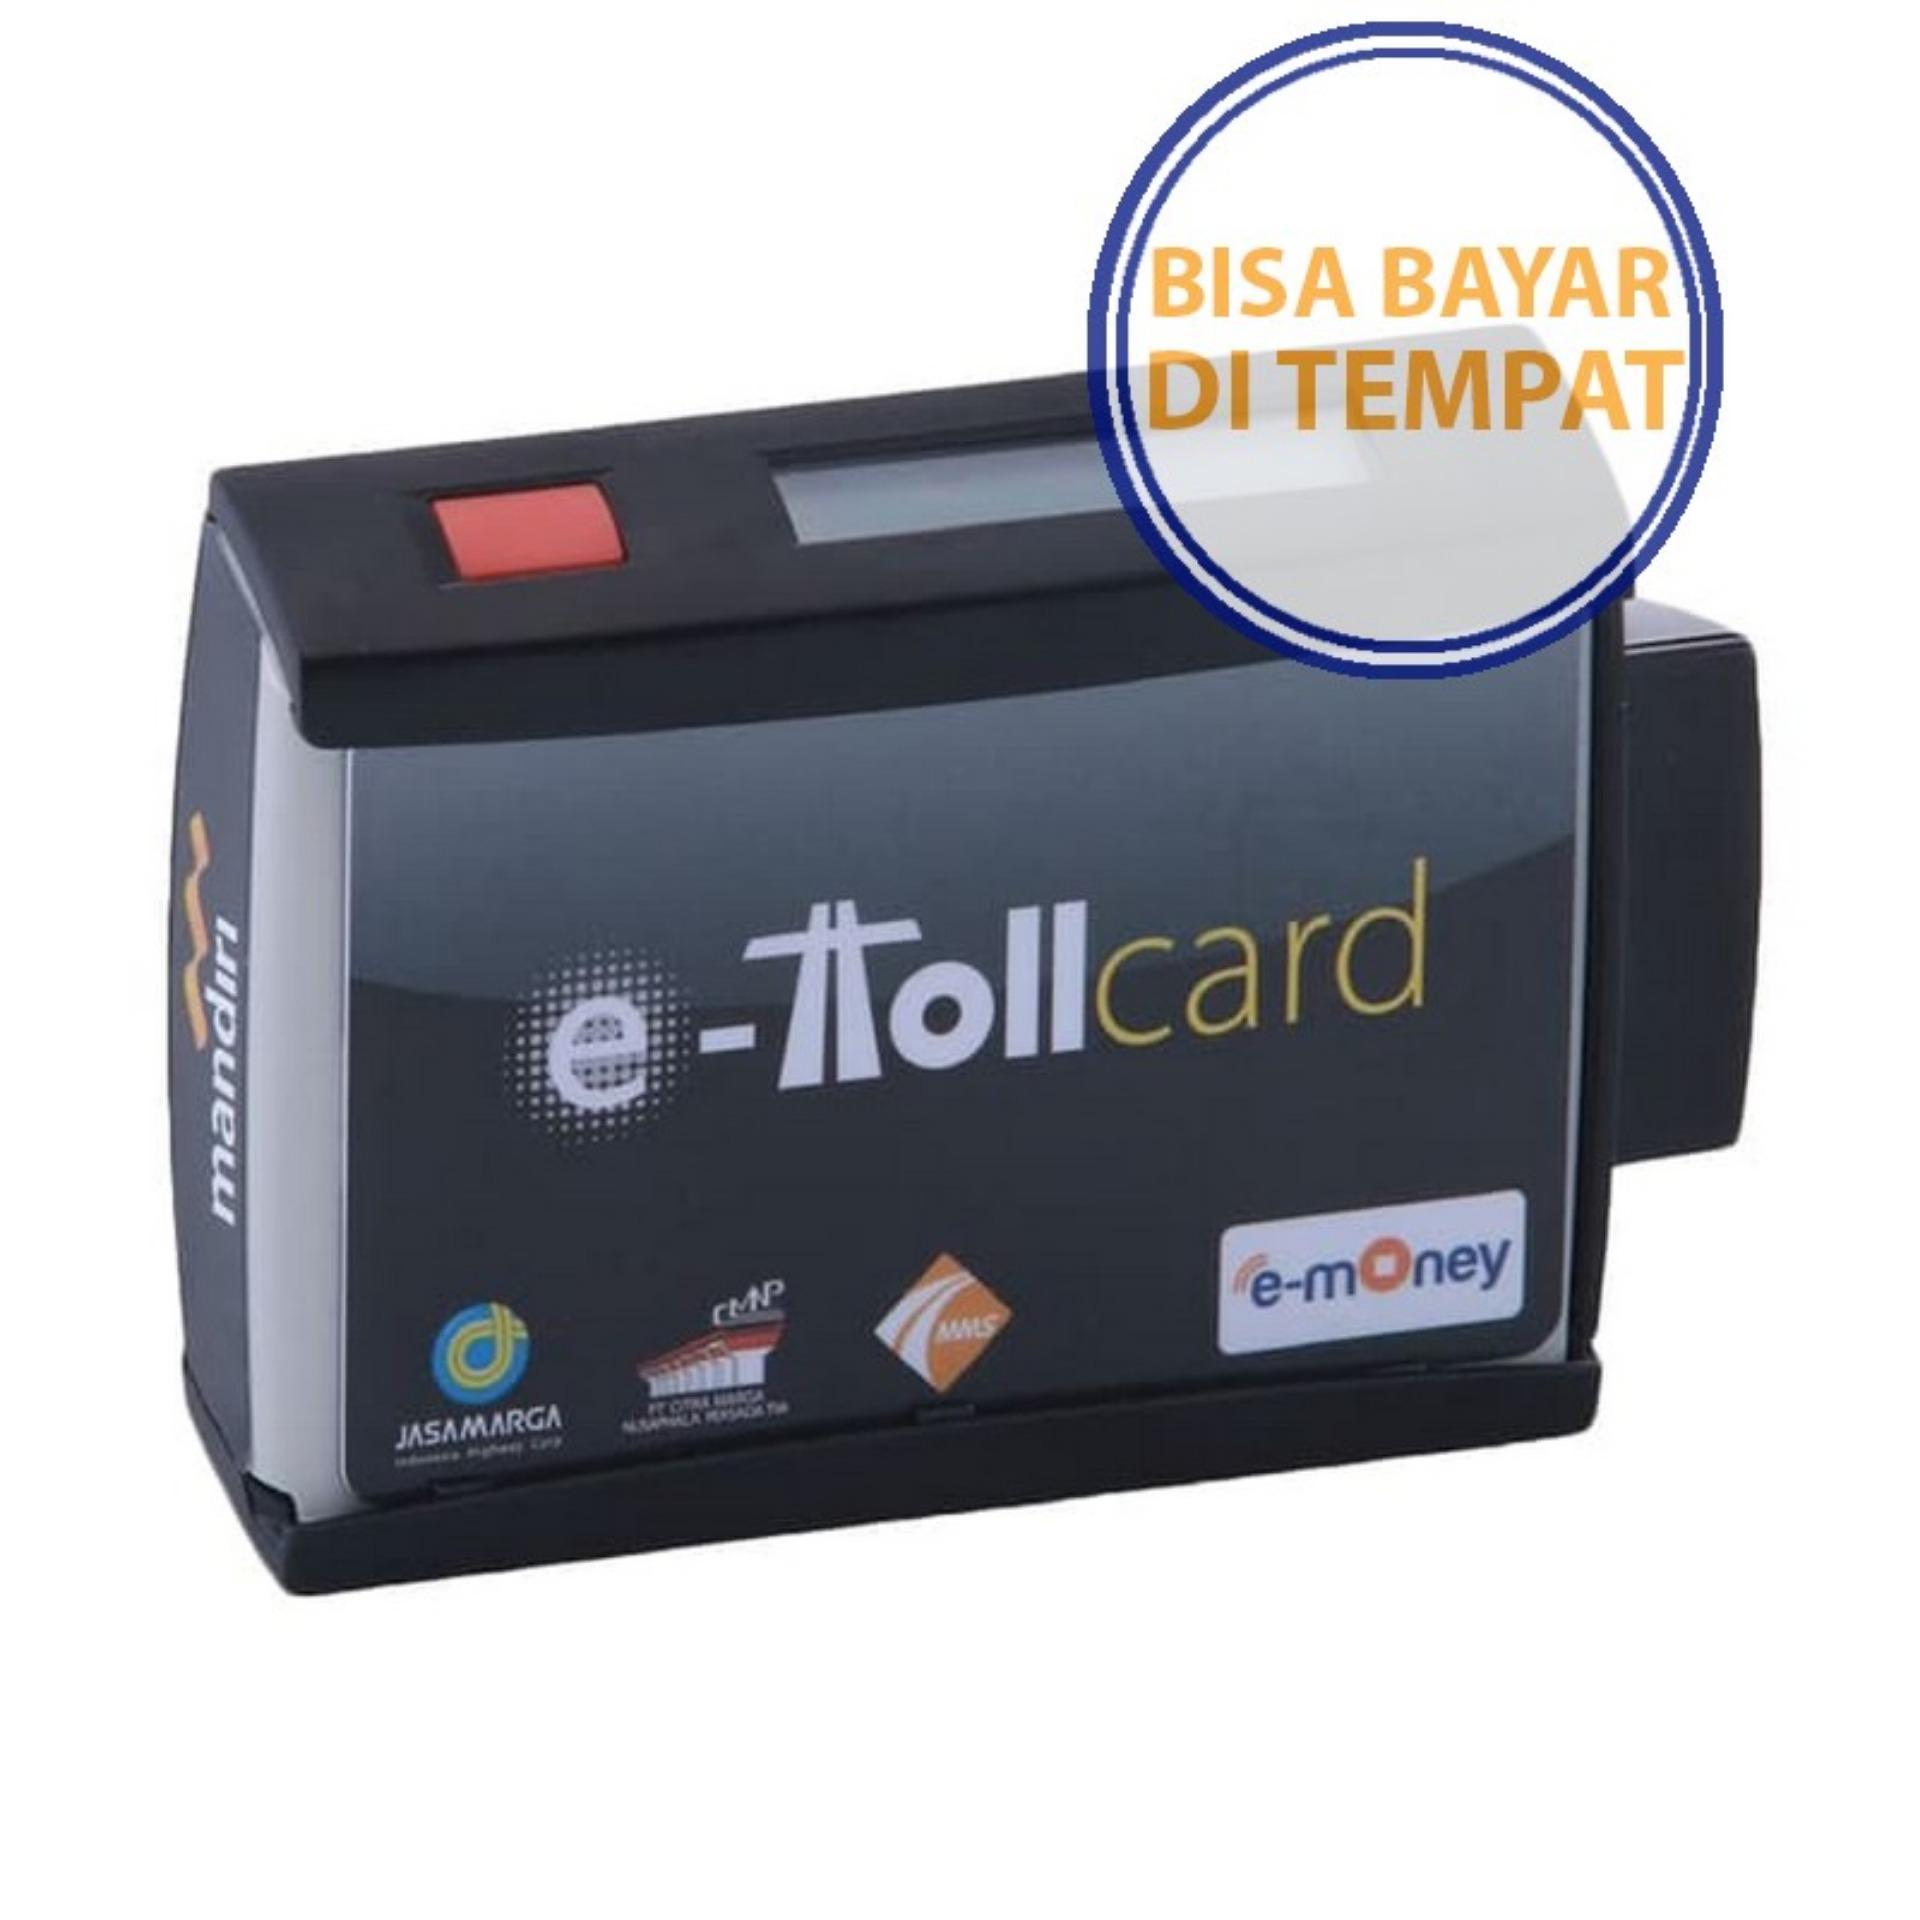 Fitur Limited Edition Kartu Emoney Batik 2 Mandiri E Money Card Toll Promo Saat Ini Mesin Etoll Pass On Board Unit Obu